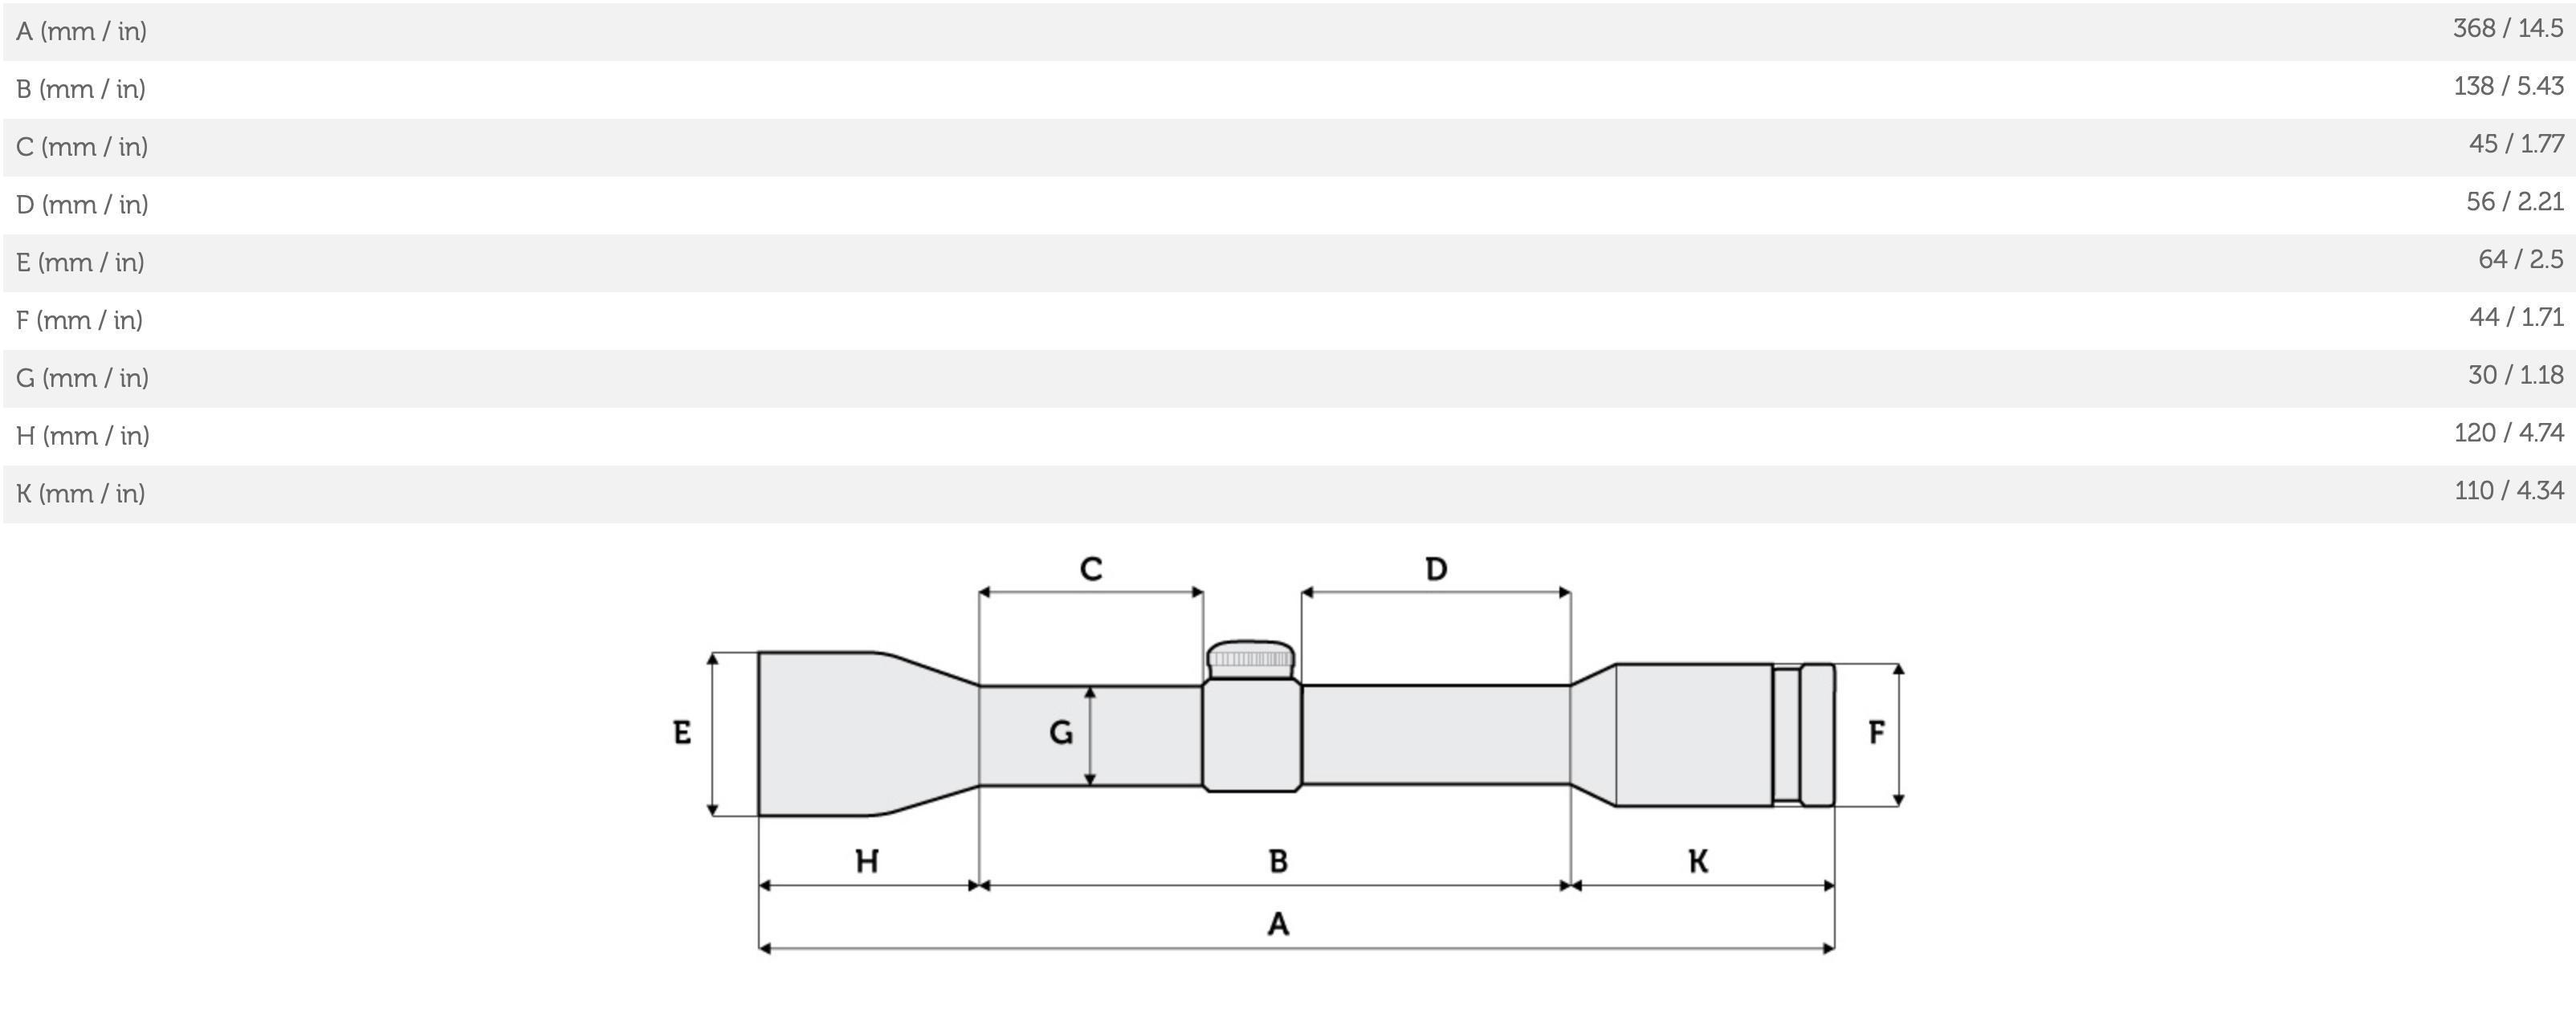 Meopta-Zielfernrohr-Optika6-3-18x56-RD-SFP-Red-Dot-4C-Reticle-2-Bildebene5N7NcHn2PEGnf